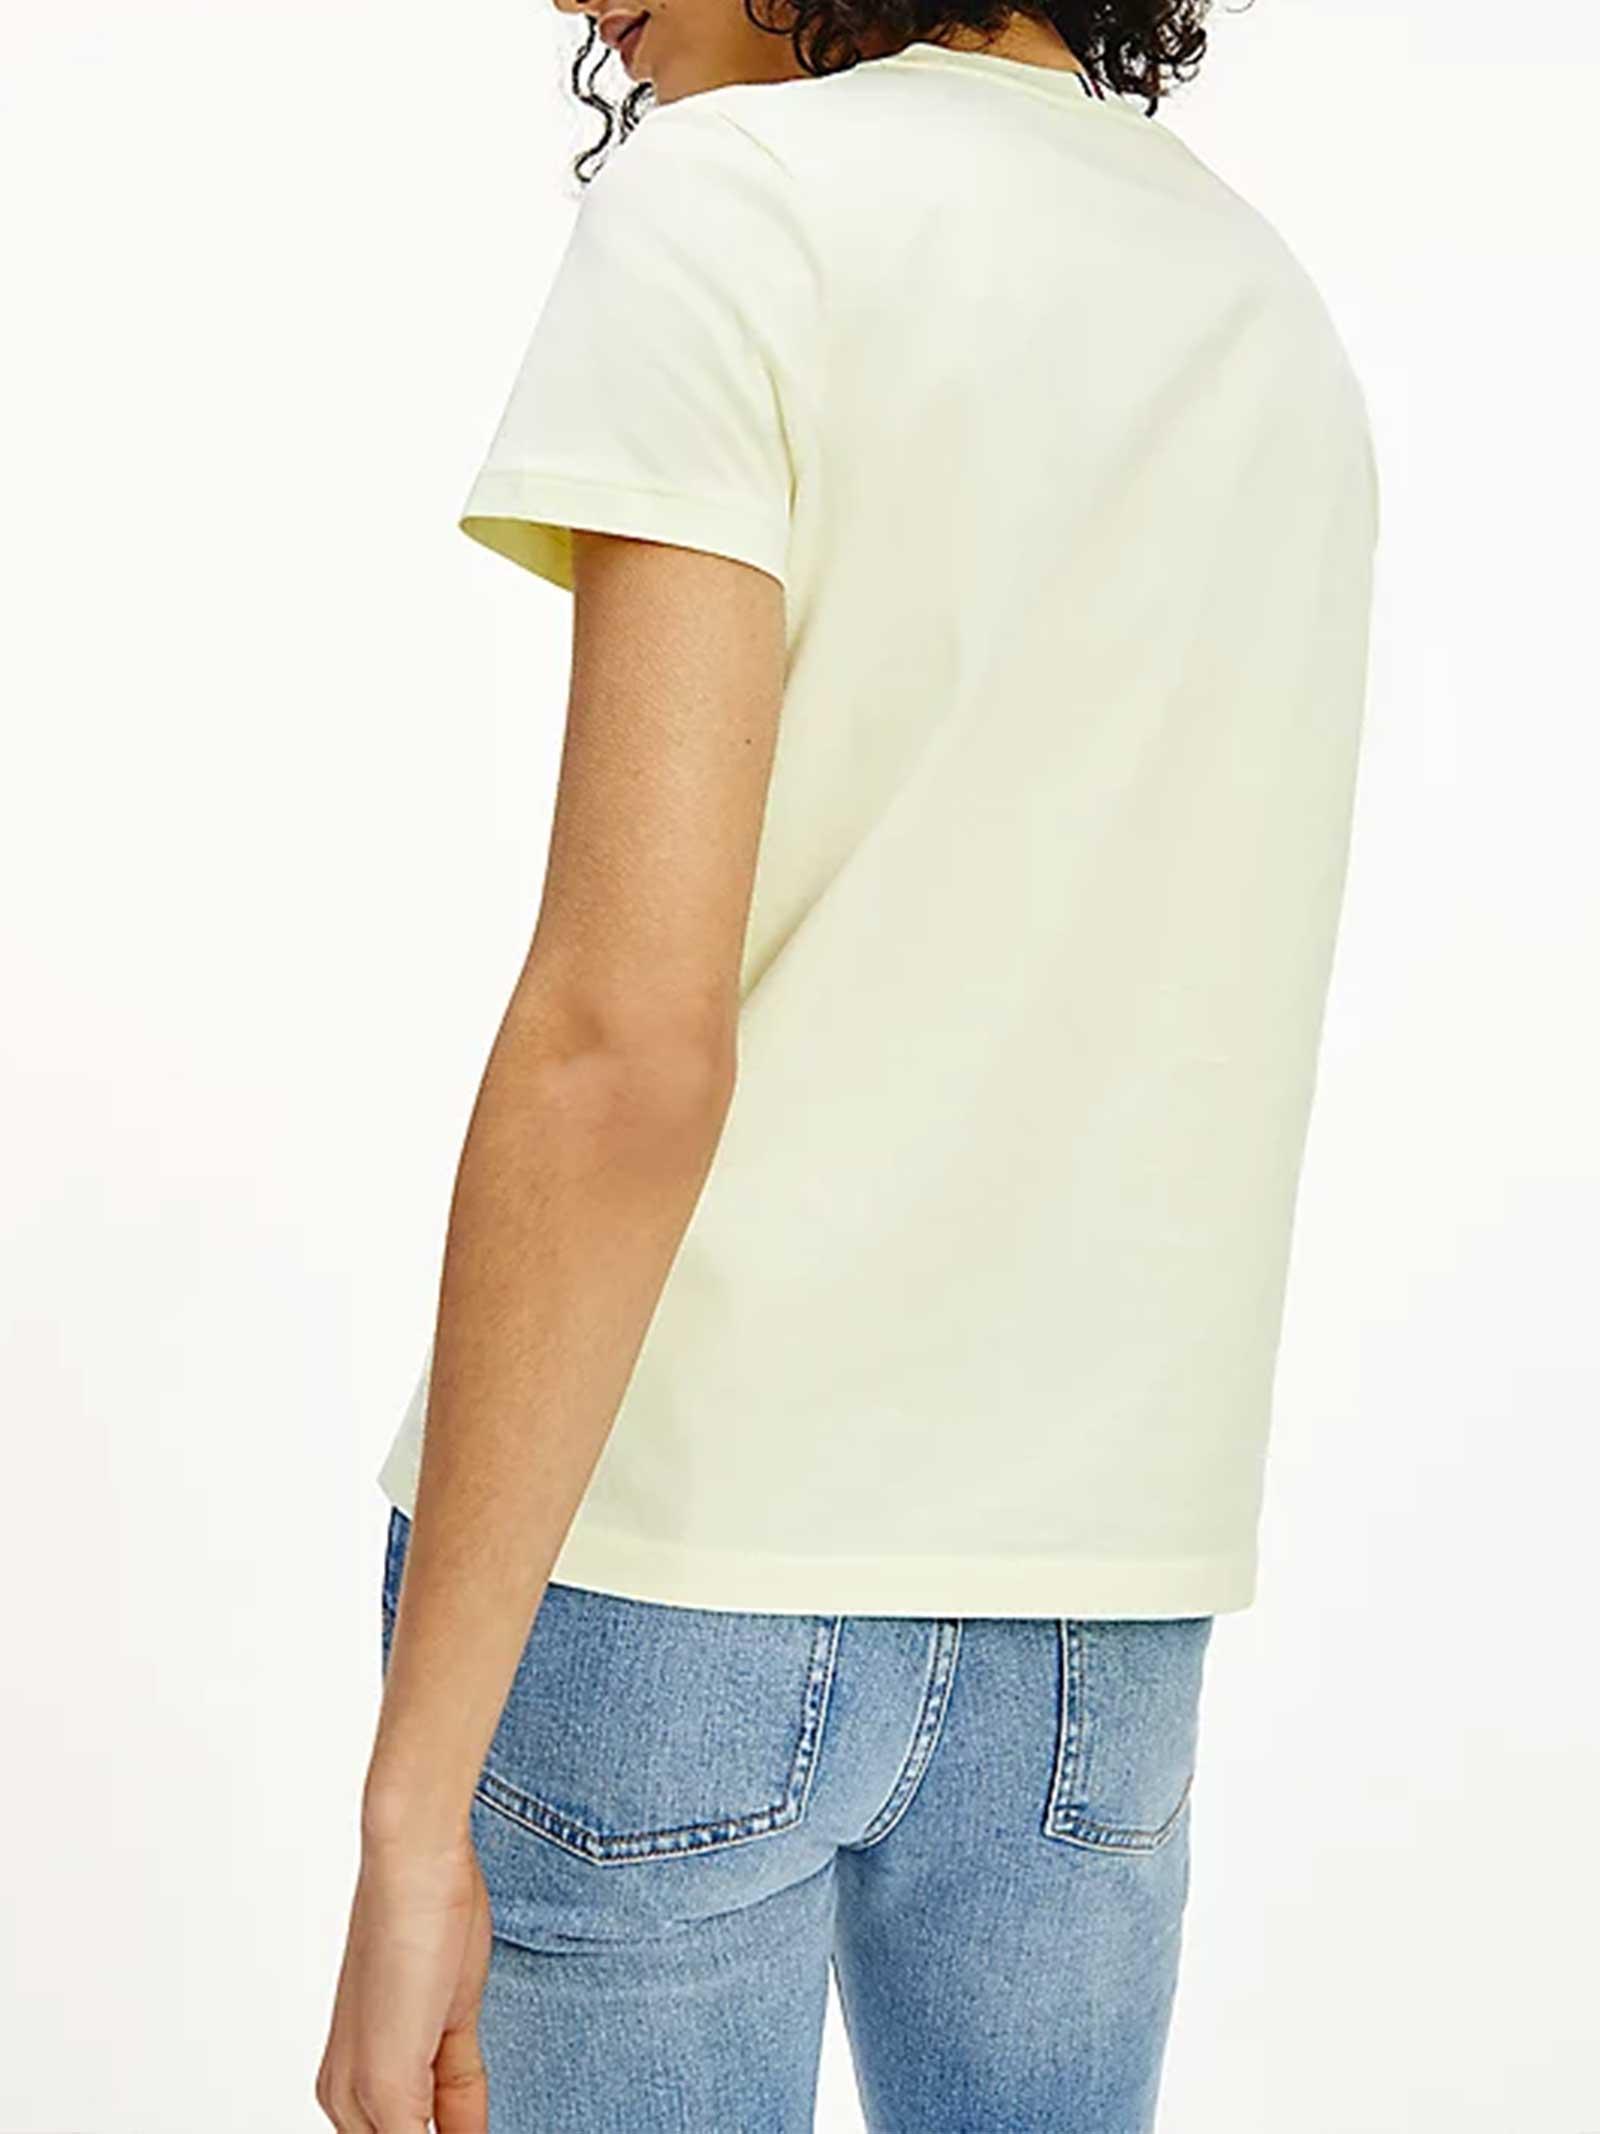 T-SHIRT DONNA TOMMY HILFIGER | T-shirt | WW0WW28682ZP5